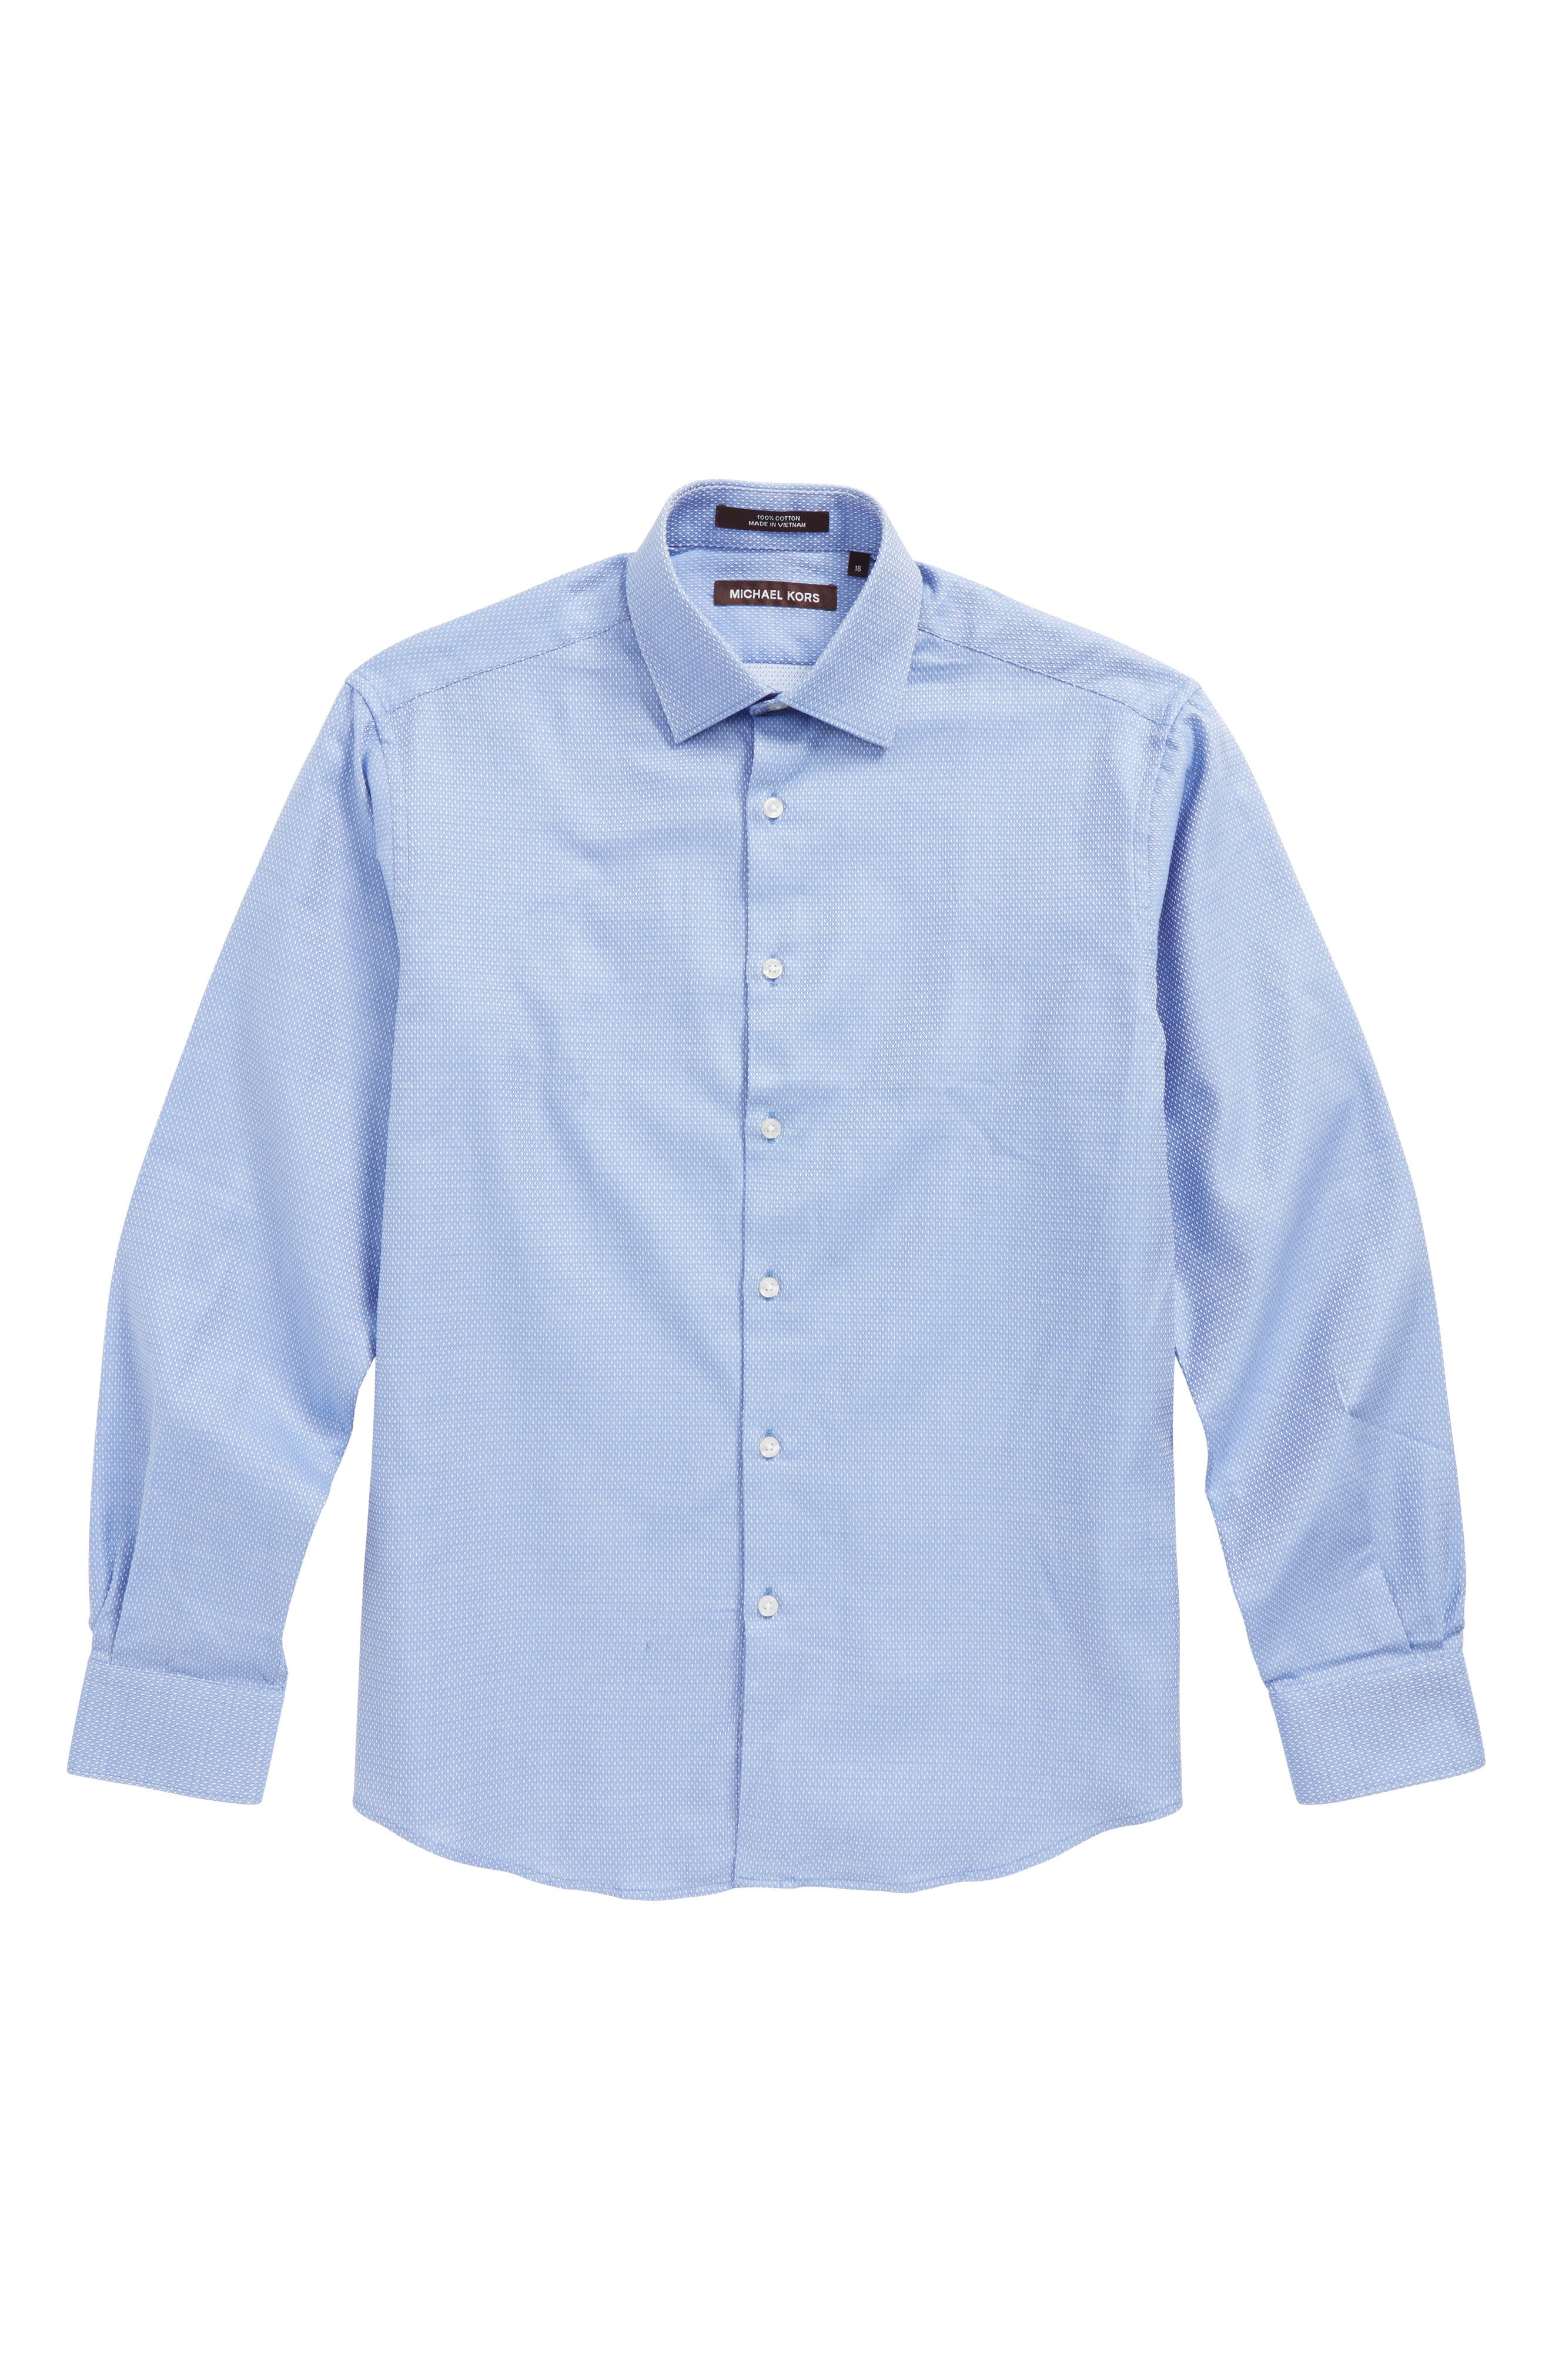 Alternate Image 1 Selected - Michael Kors Micro Dot Dress Shirt (Big Boys)